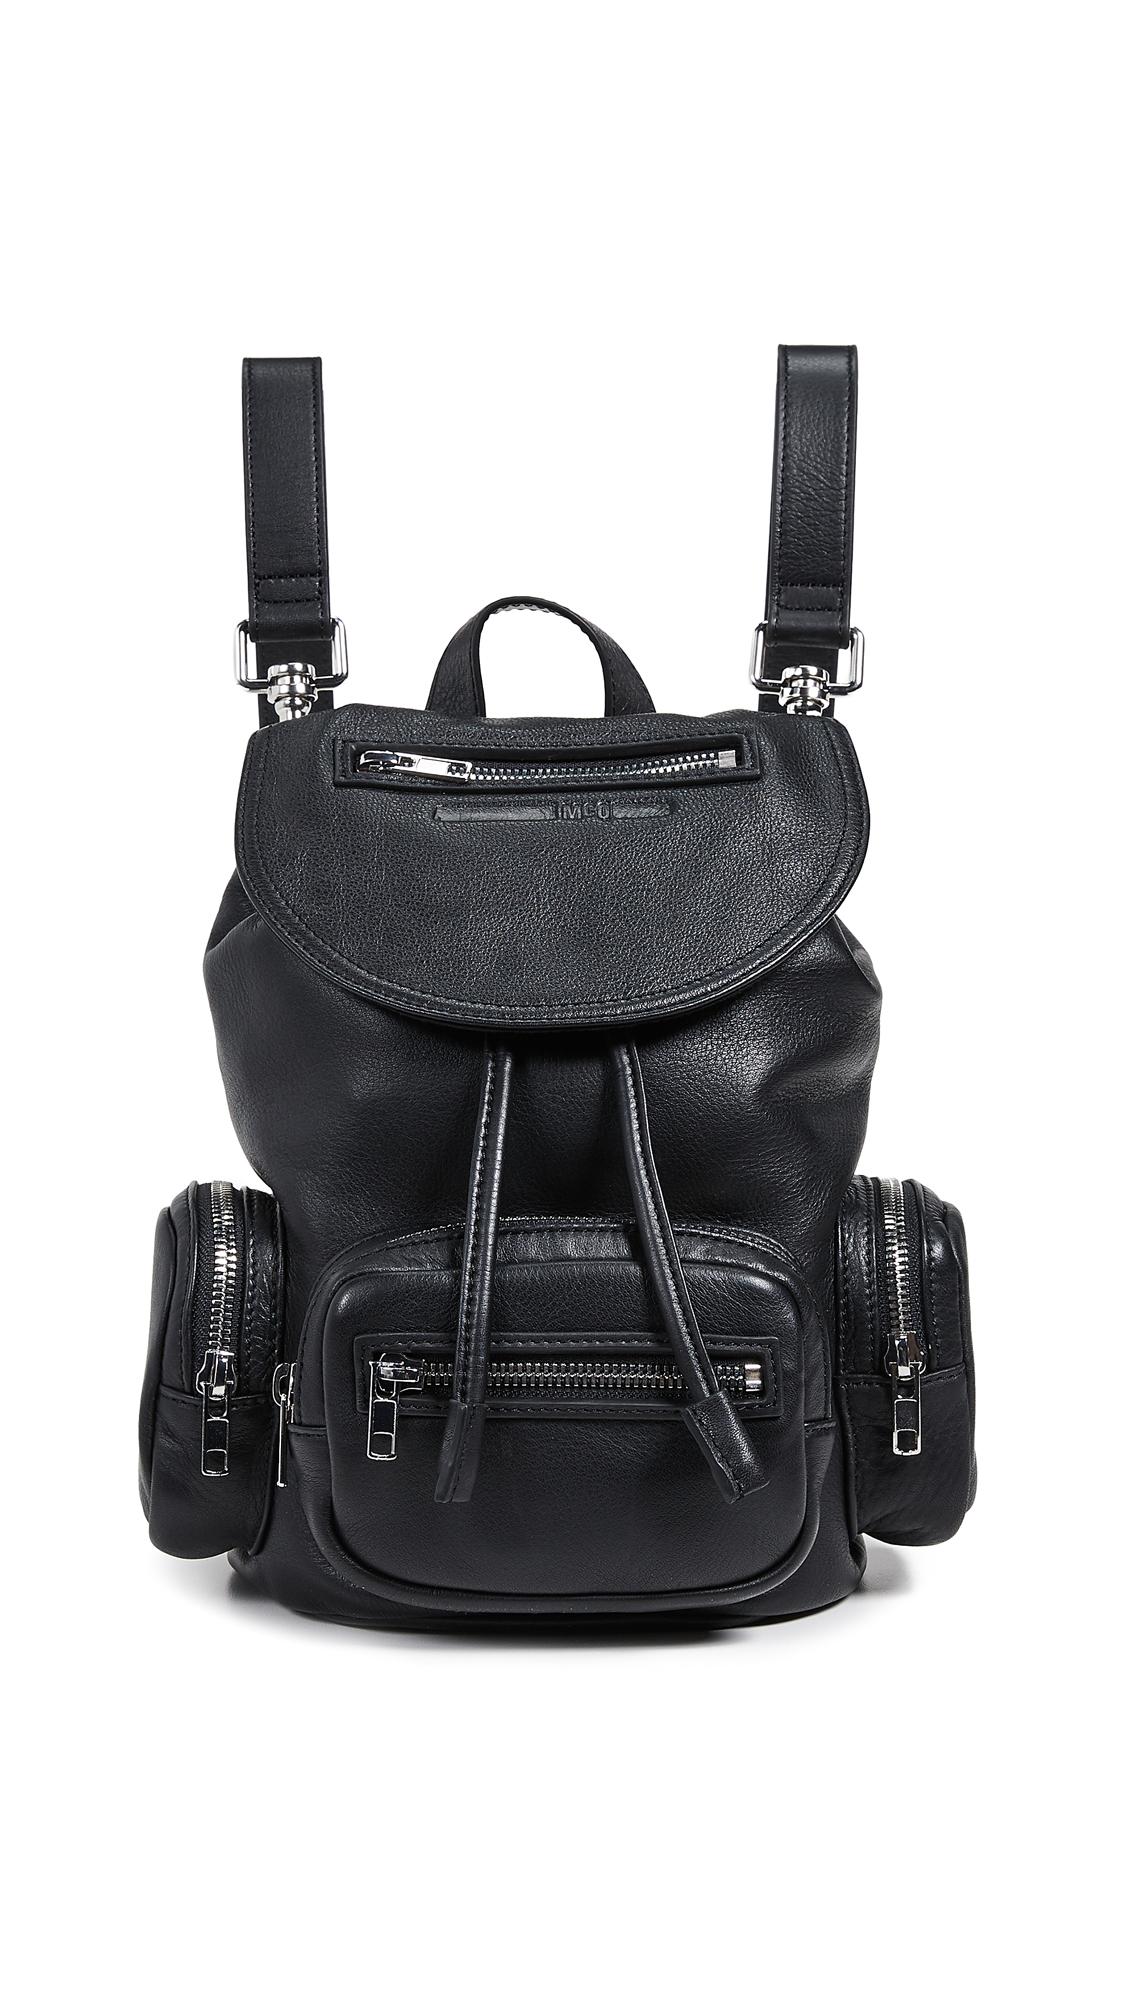 Mini Convertible Drawstring Backpack in Black